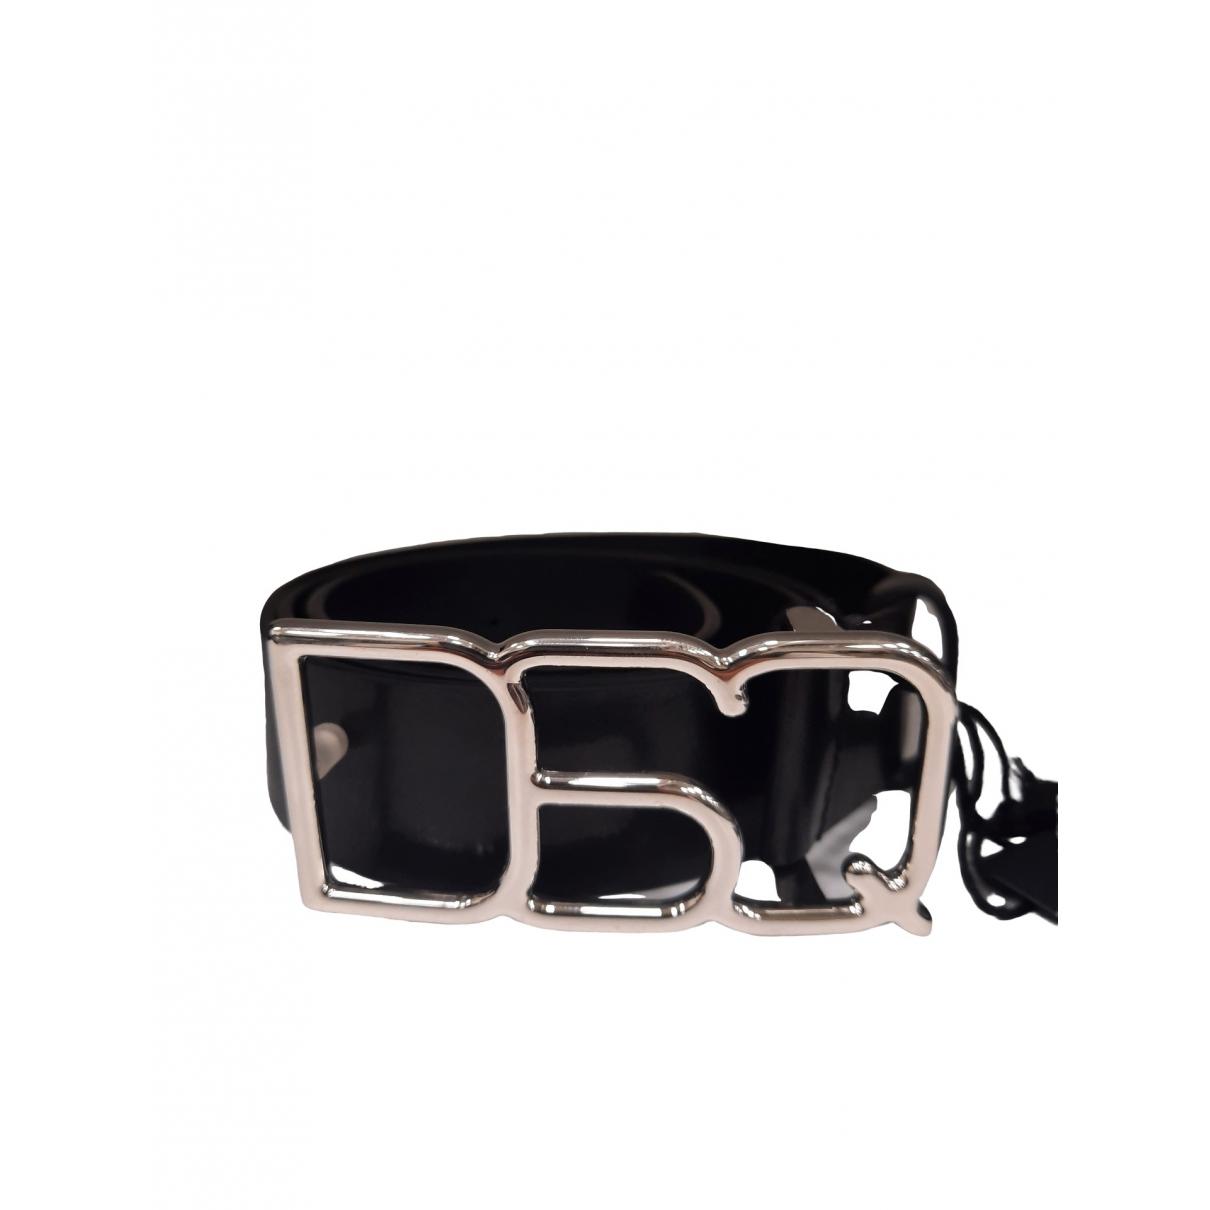 Cinturon de Cuero Dsquared2